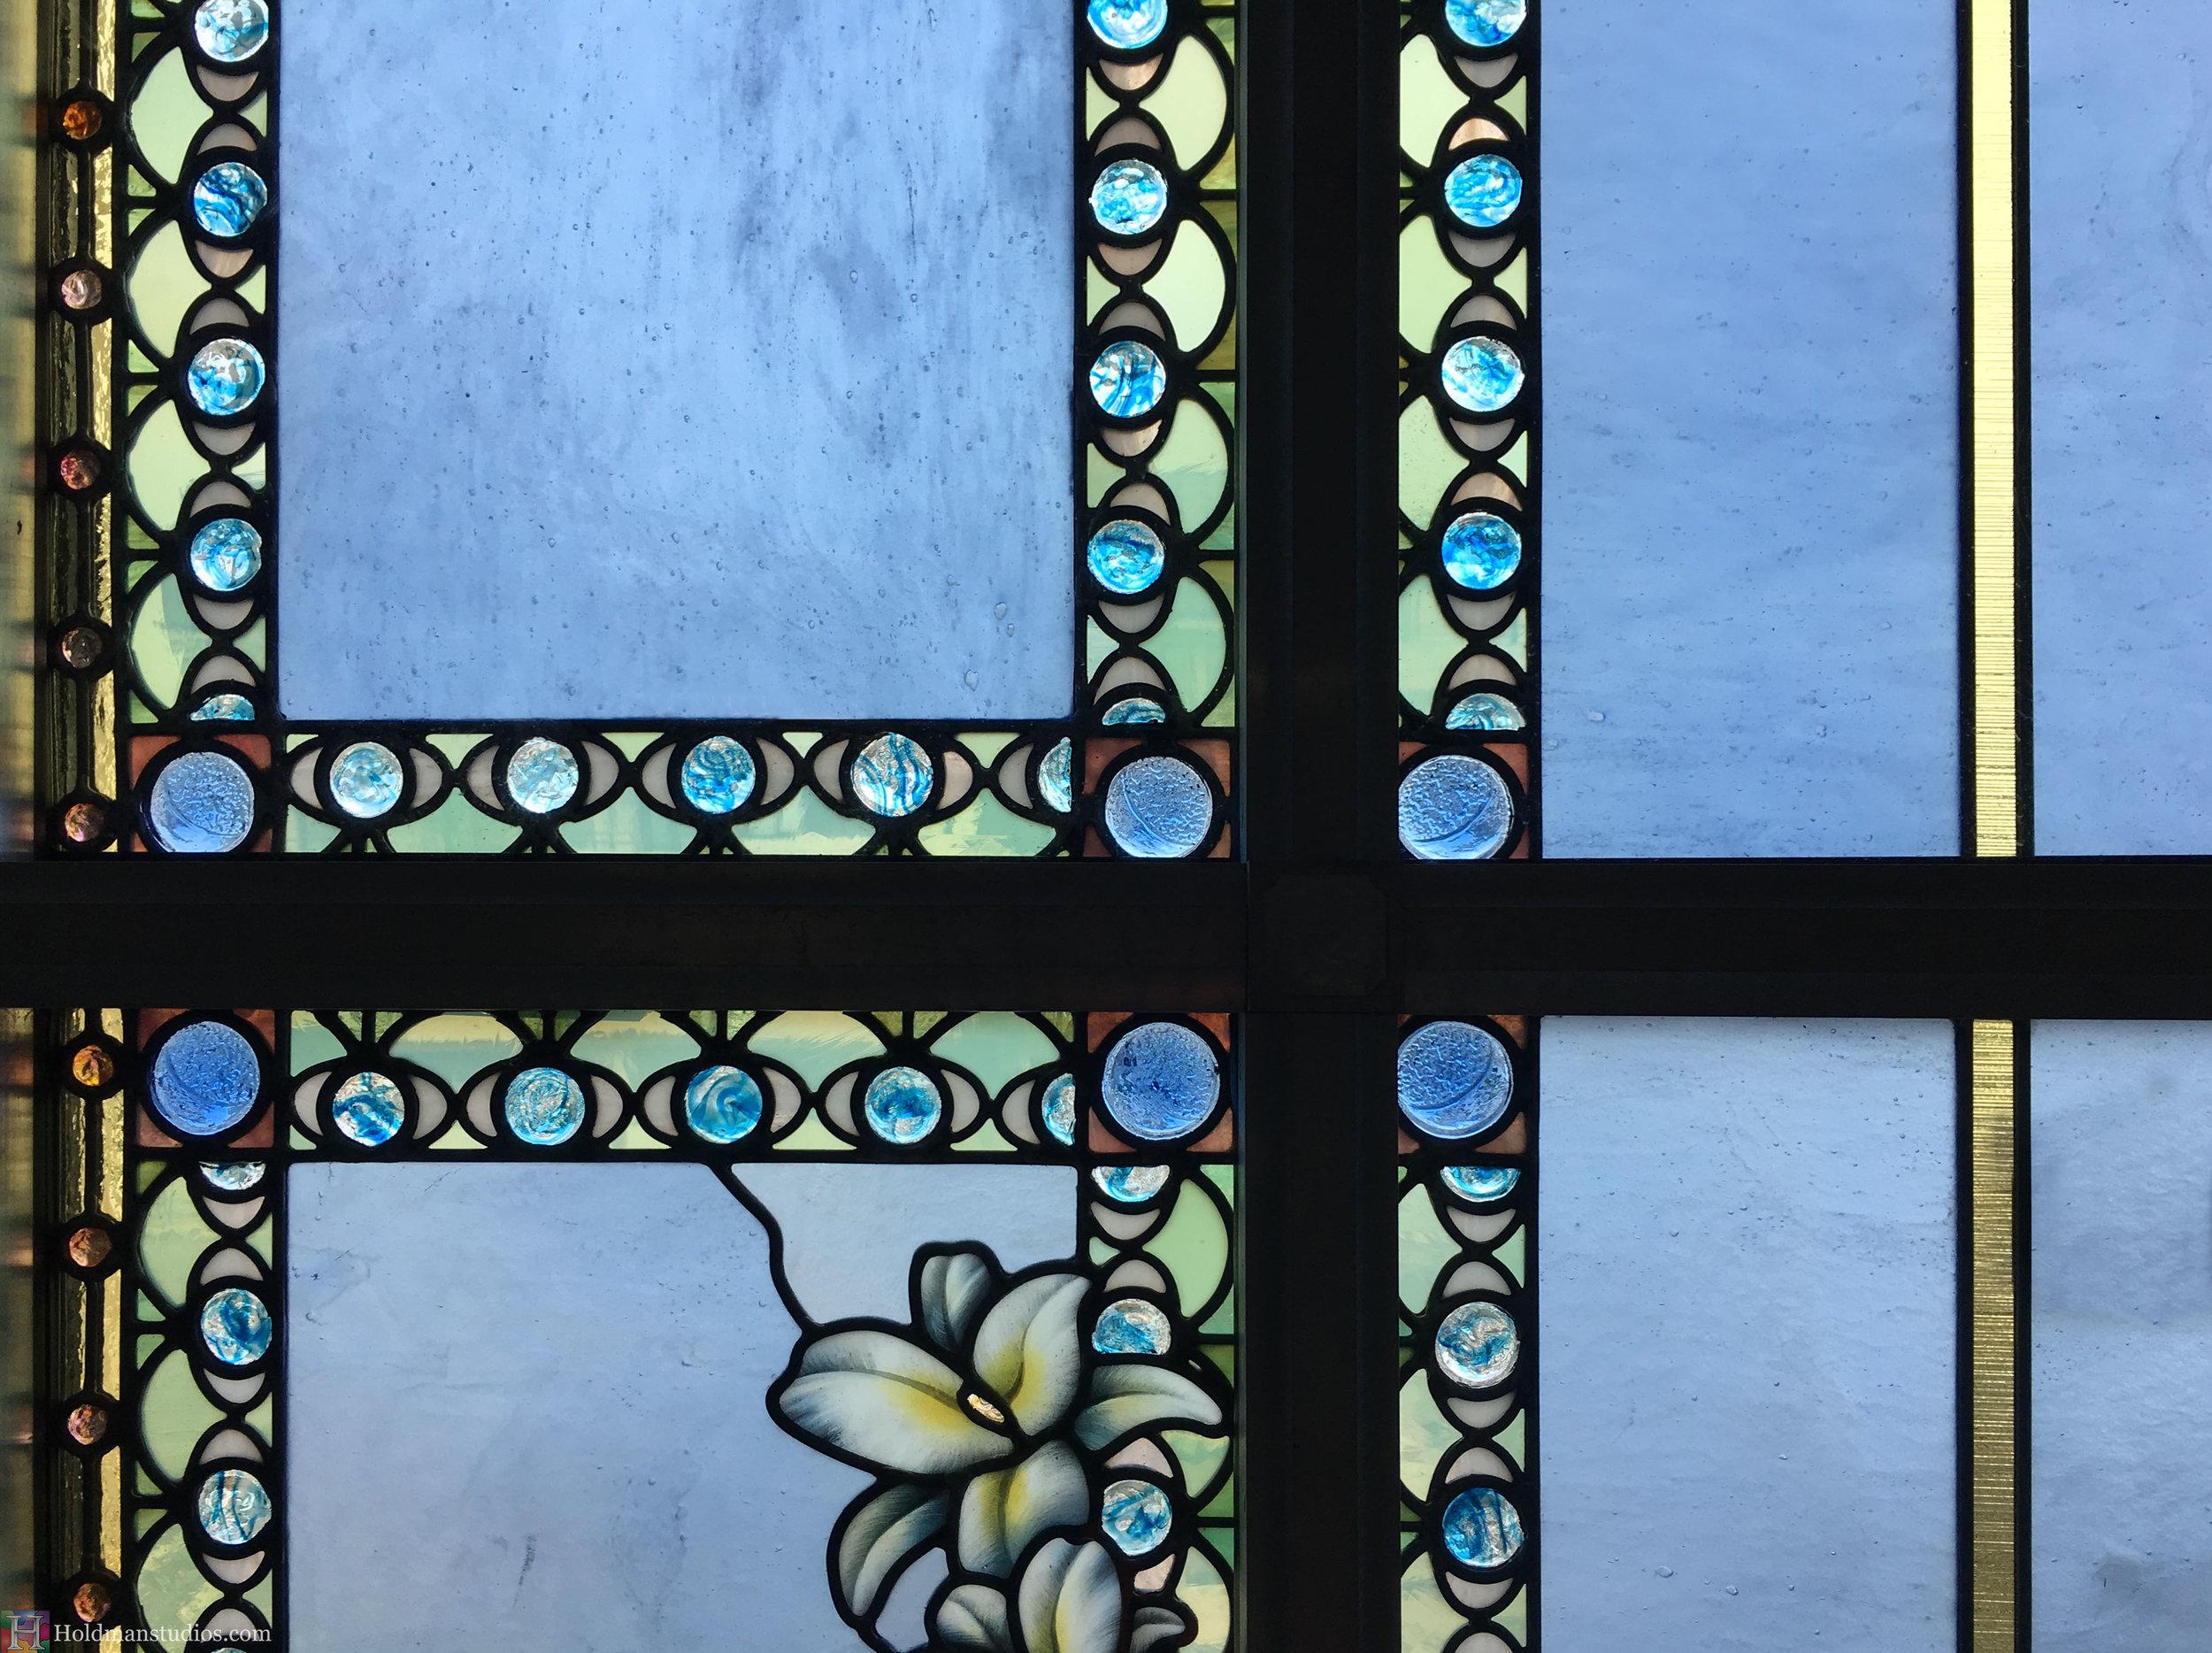 Holdman-Studios-Stained-Glass-Paris-LDS-Temple-Madonna-Lily-Flowers-Leaves-Handmade-Moom-Jewels-Crop-Window.jpg